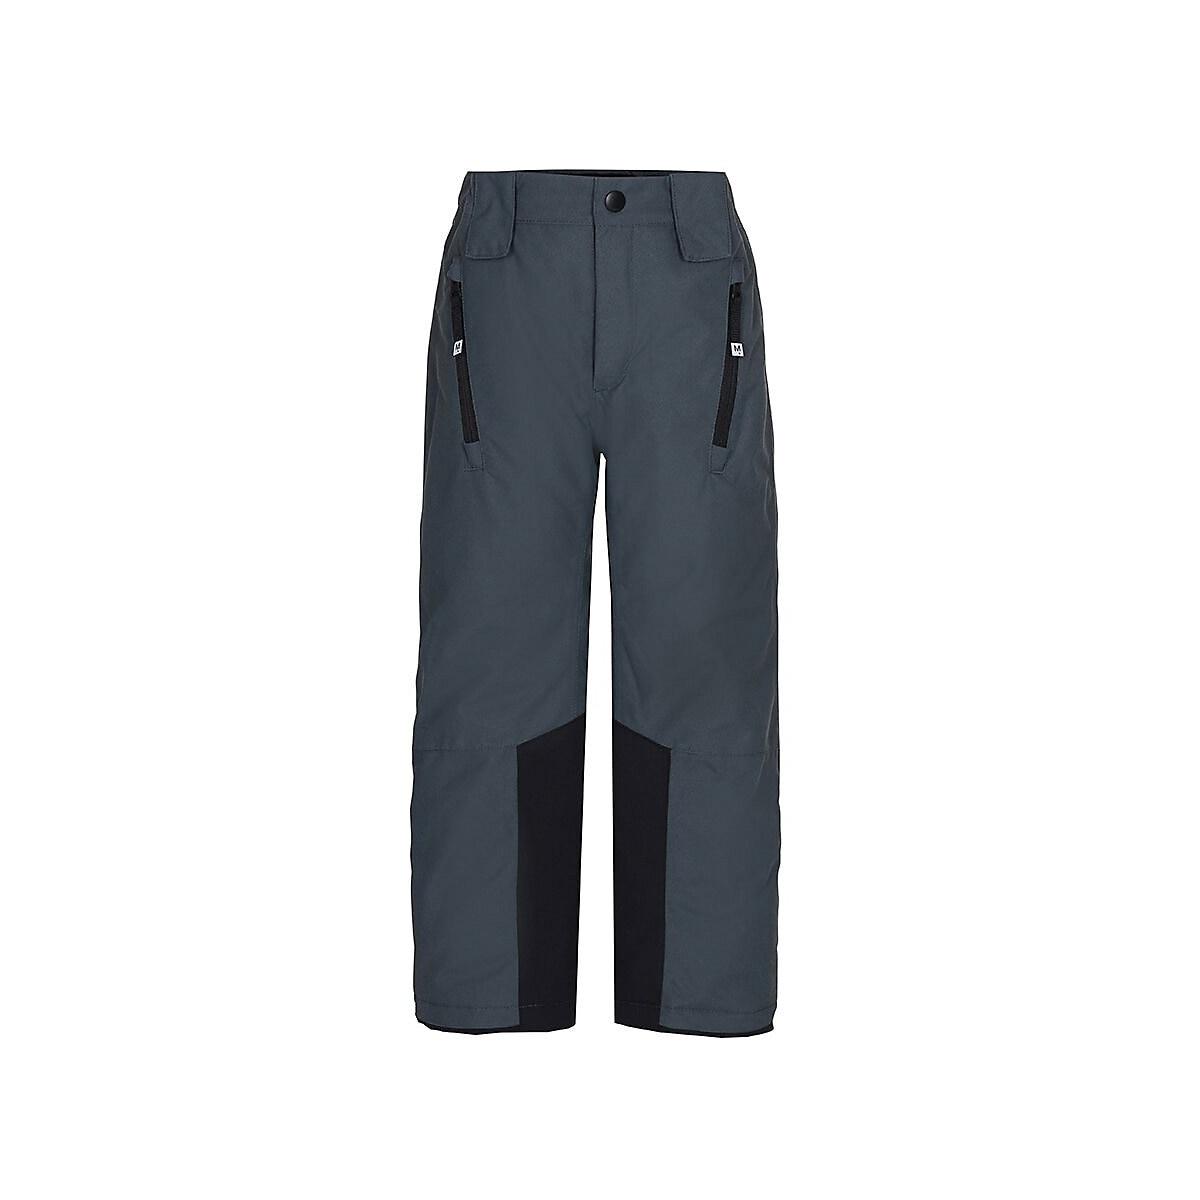 Pants & Capris MOLO for boys 9170614 Leggings Hot Warm Children clothes Kids MTpromo pants playtoday for boys 377018 children clothes kids clothes